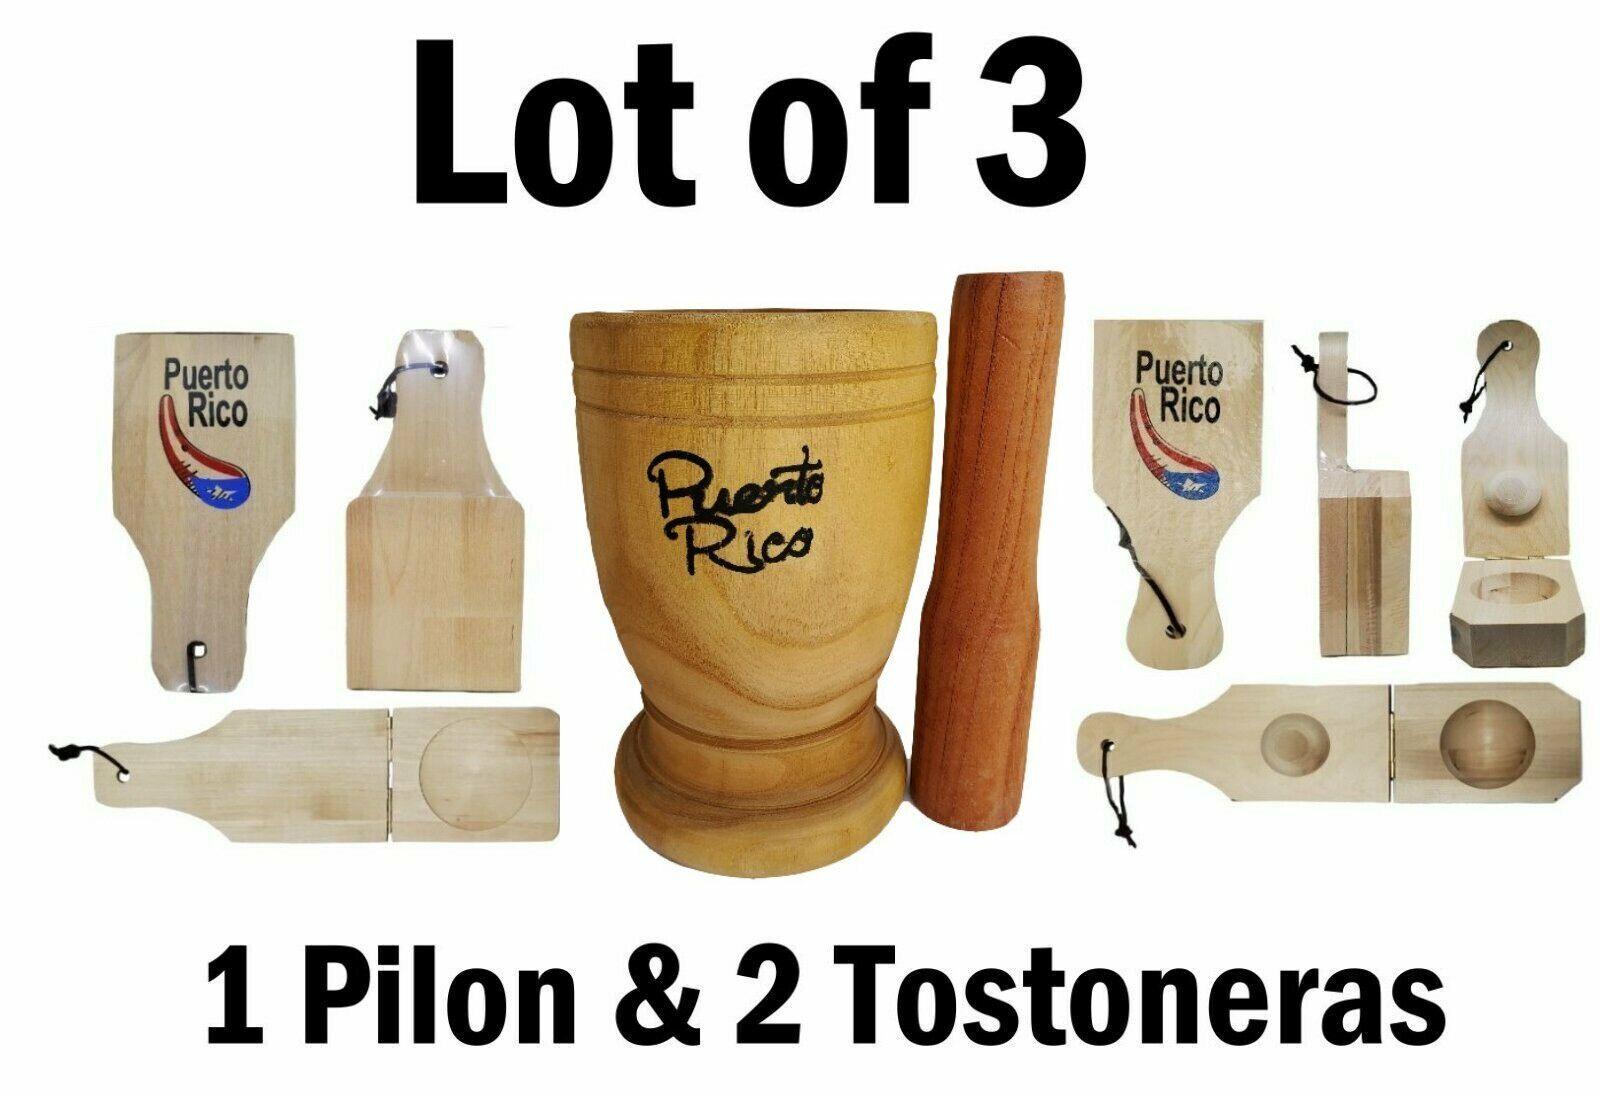 1 stuff Puerto Rico X-Large Size Wood Mortar /& Pestle /& 2 tostonera 1 regular